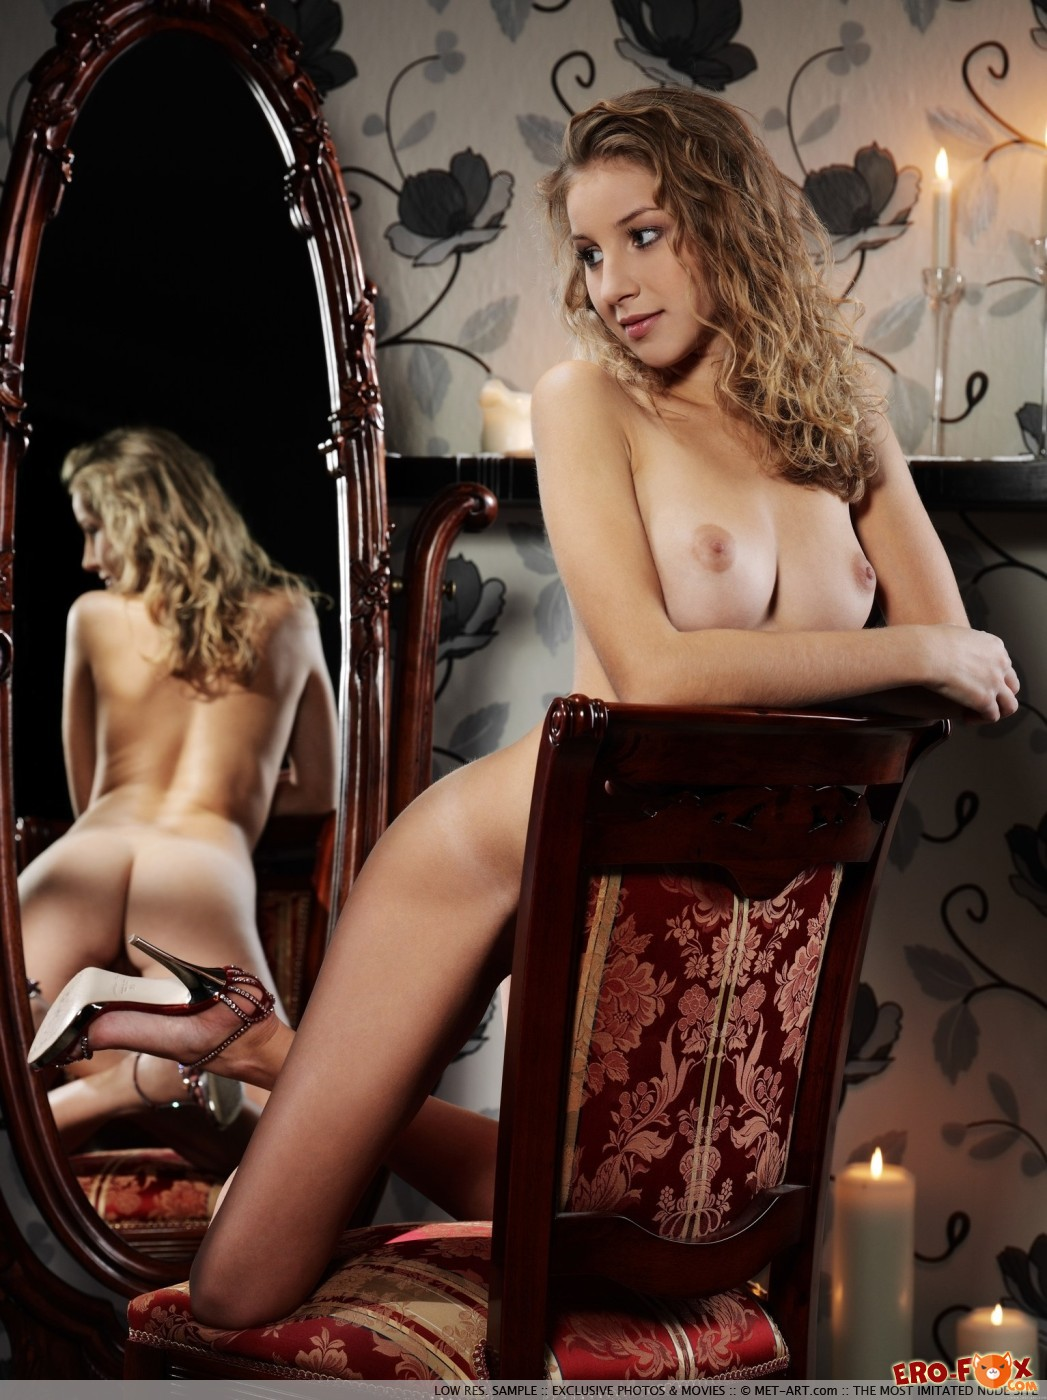 Шалунья смотрит на письку в зеркале перед сном - фото